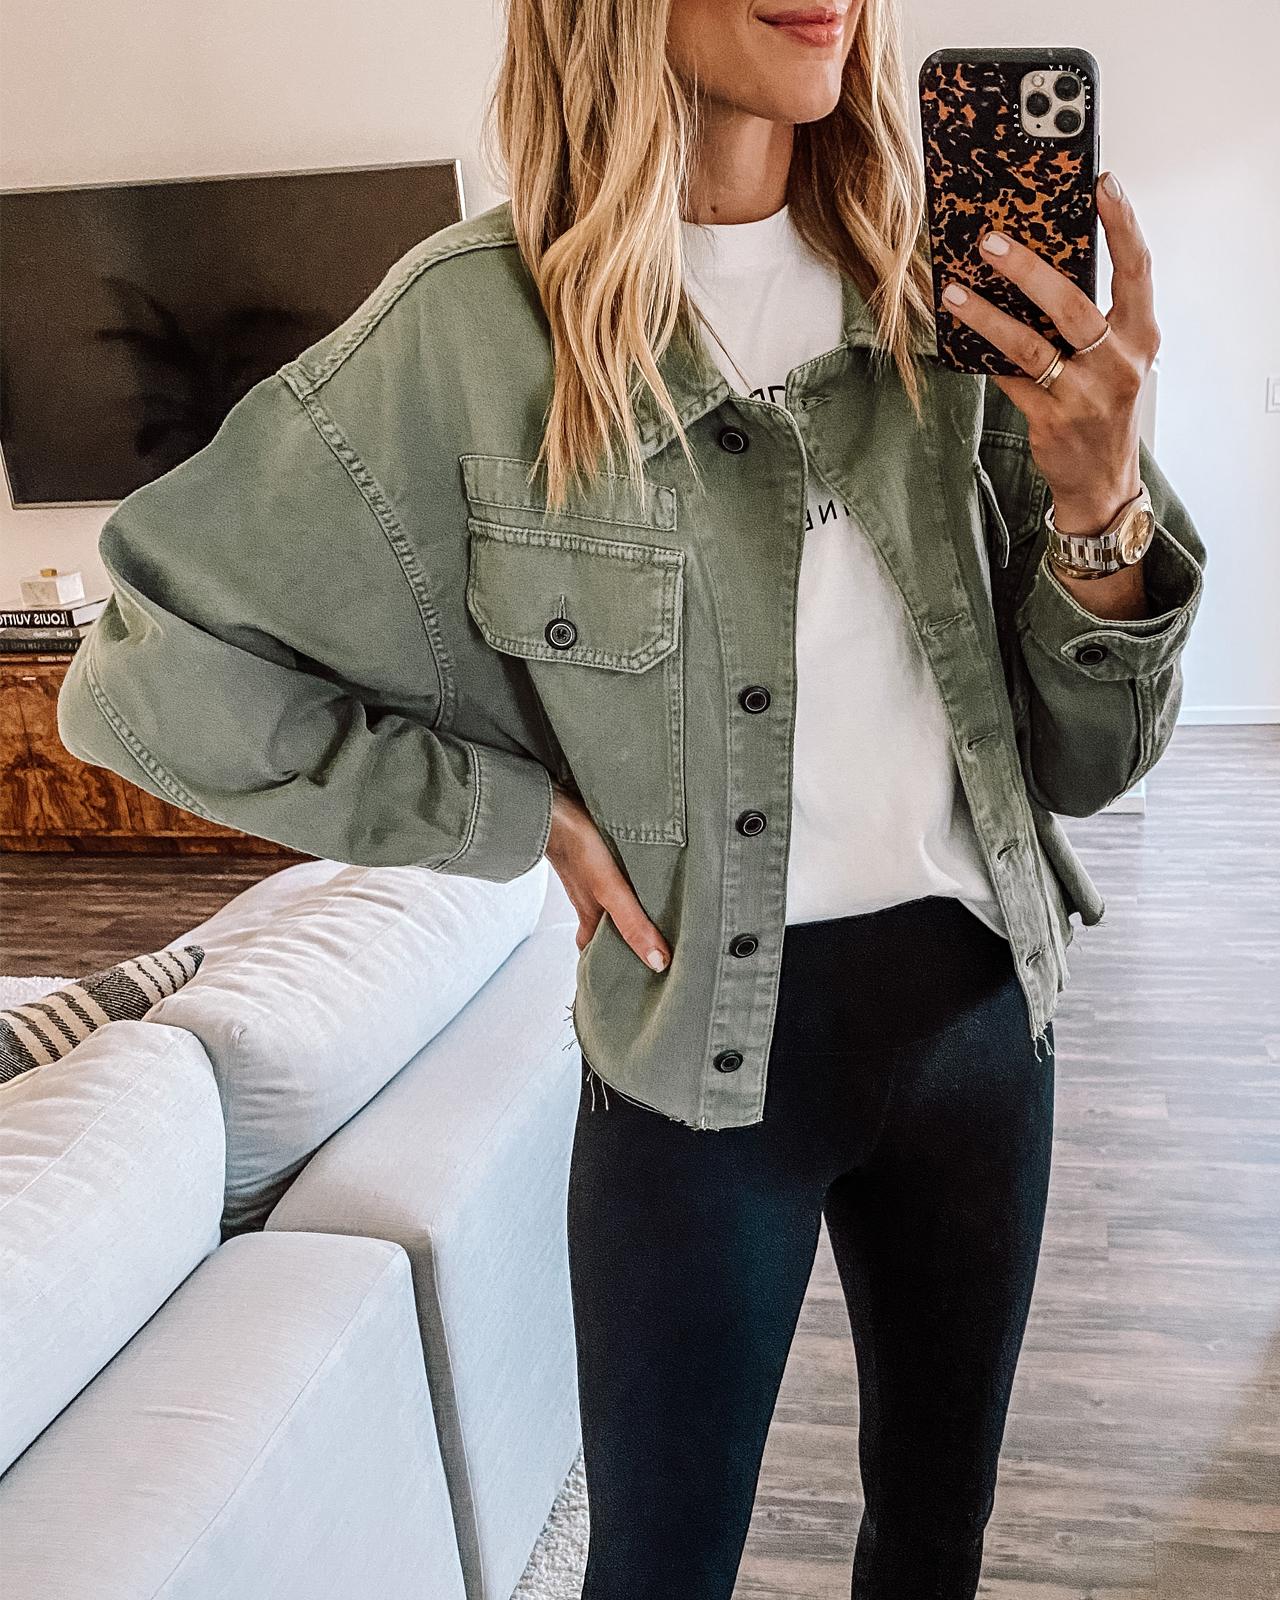 Fashion Jackson Wearing All Saints Green Utility Jacket White Anine Bing Graphic Tshirt Black Leggings 1